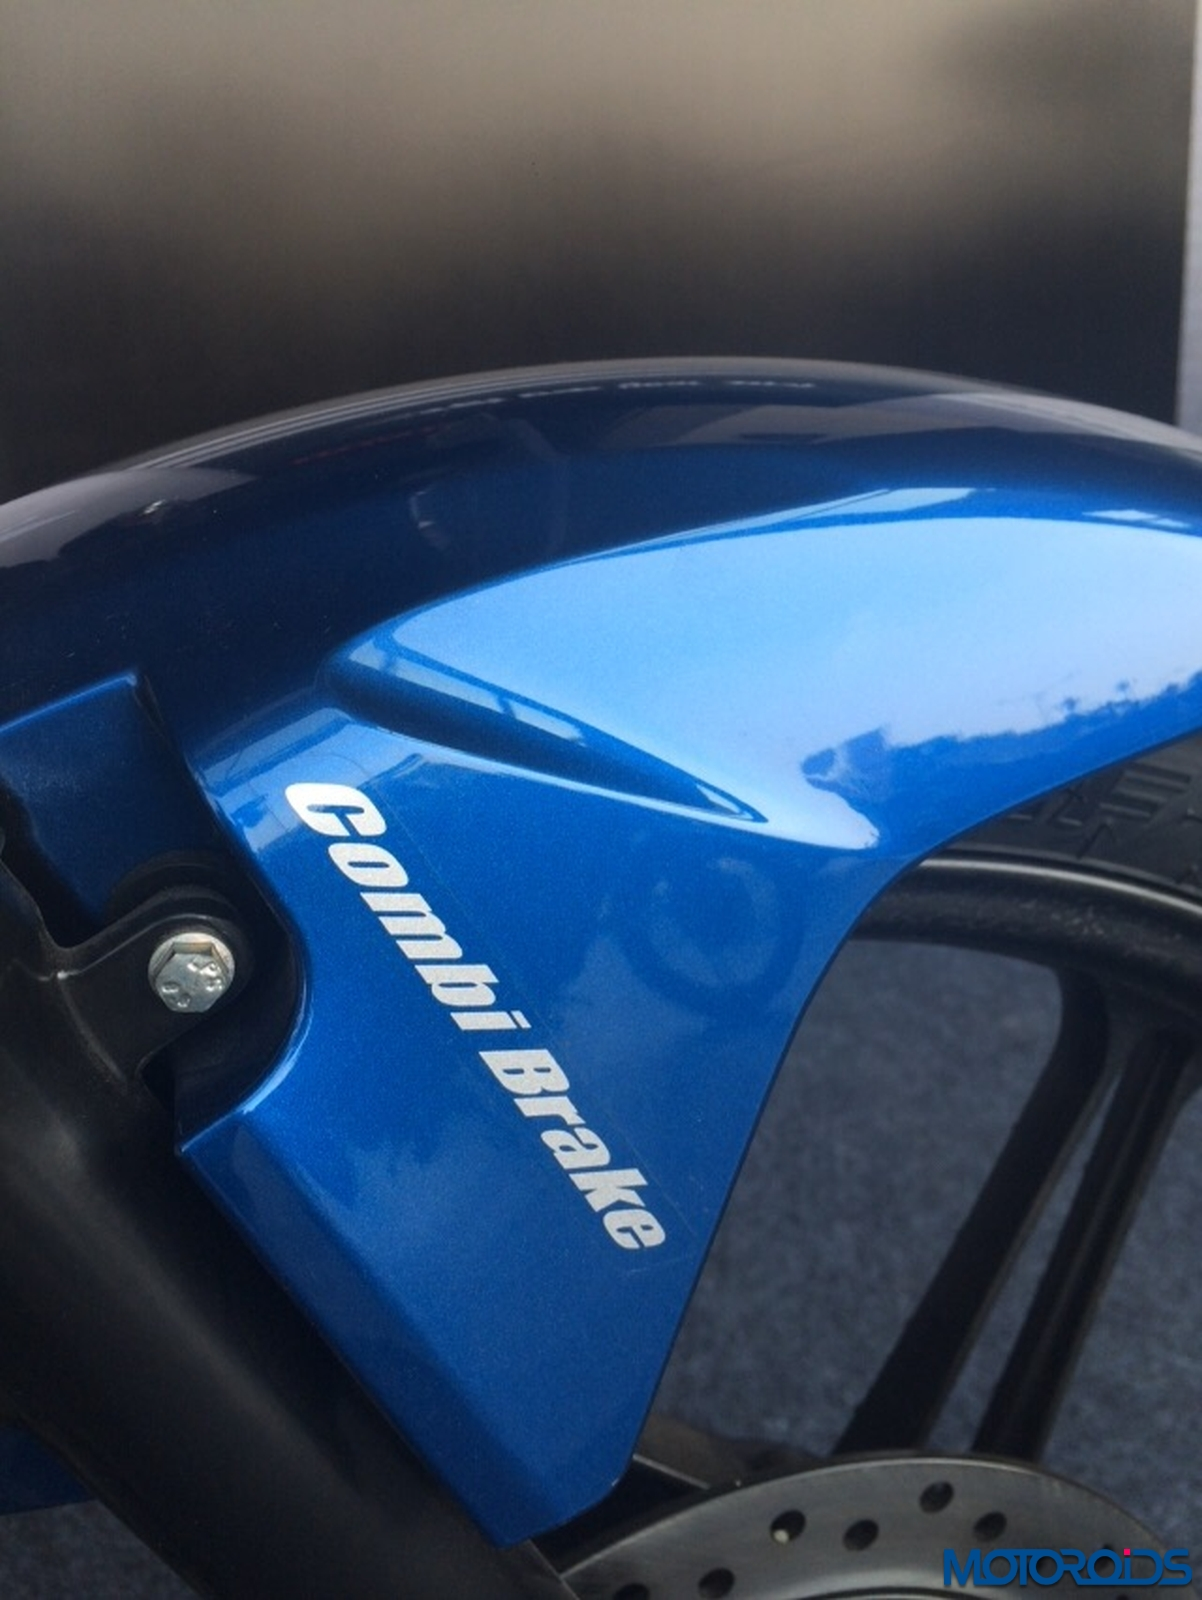 The combi brake label